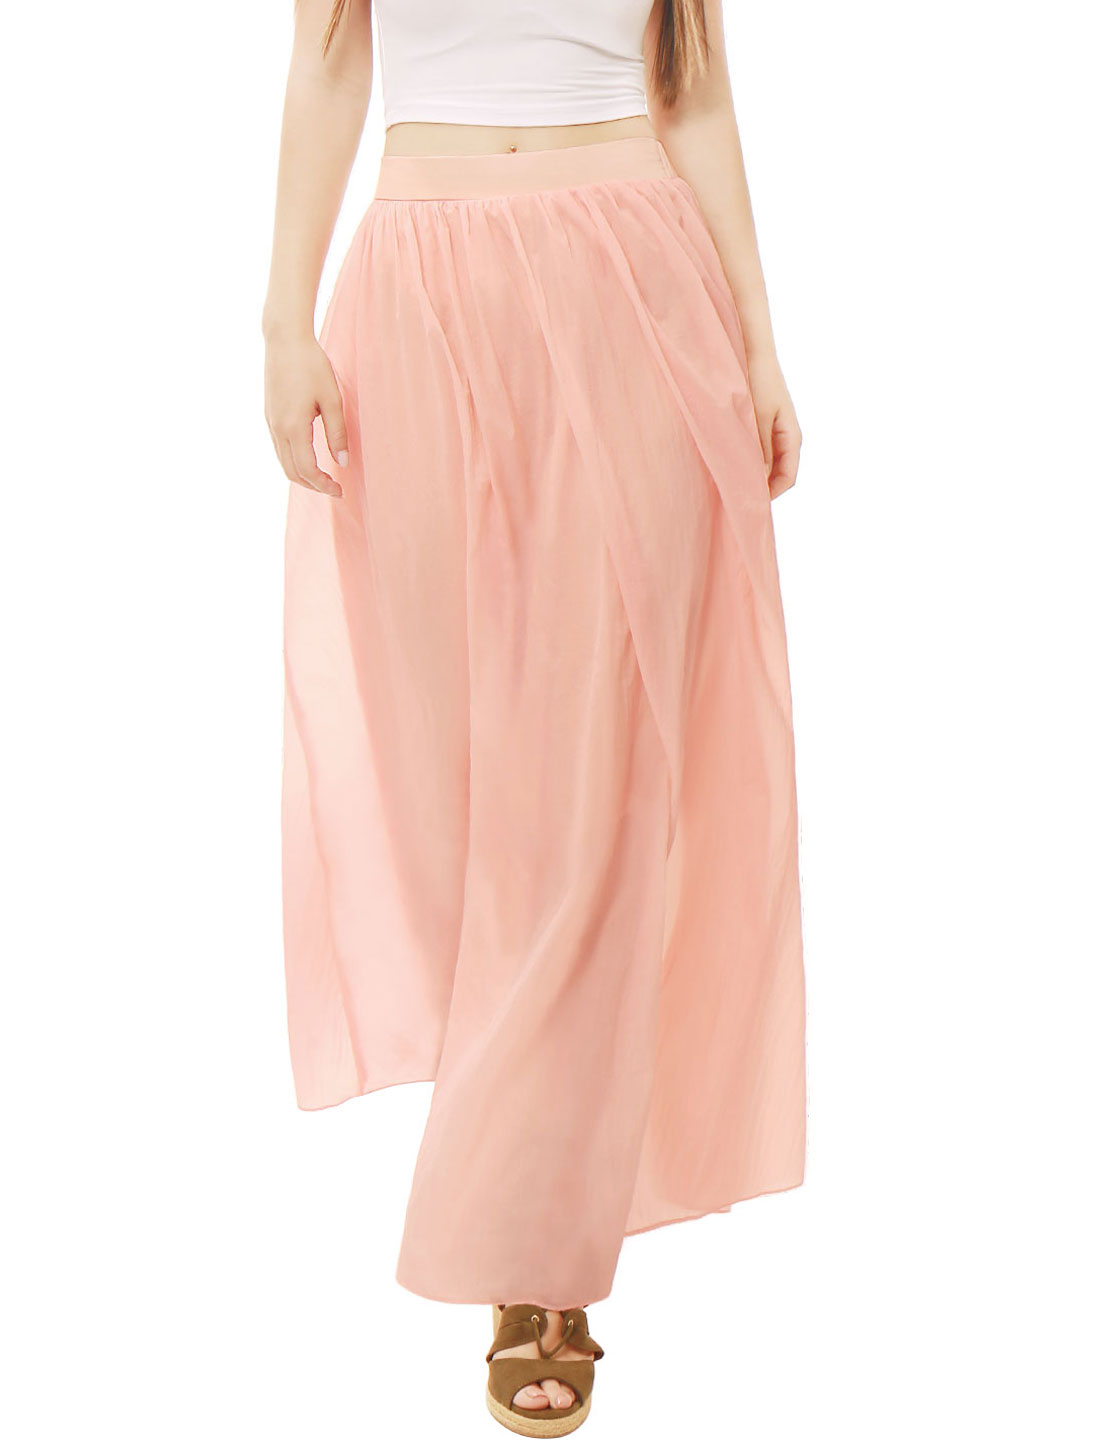 Women Pleated Elastic Waist Flowy Boho Maxi Skirt Pink S